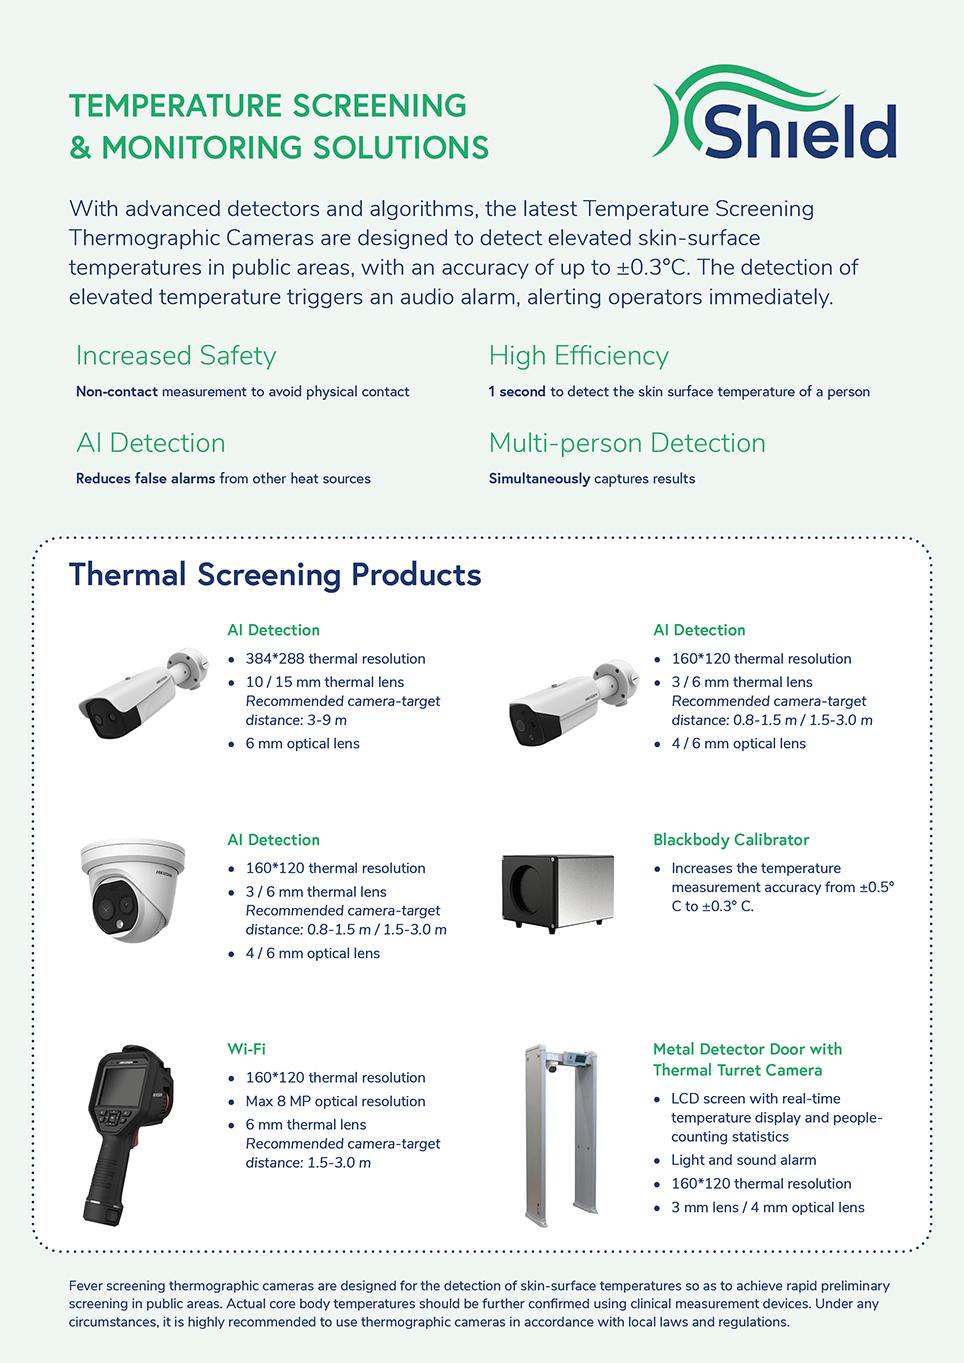 temperature-monitoring-and-screening-image